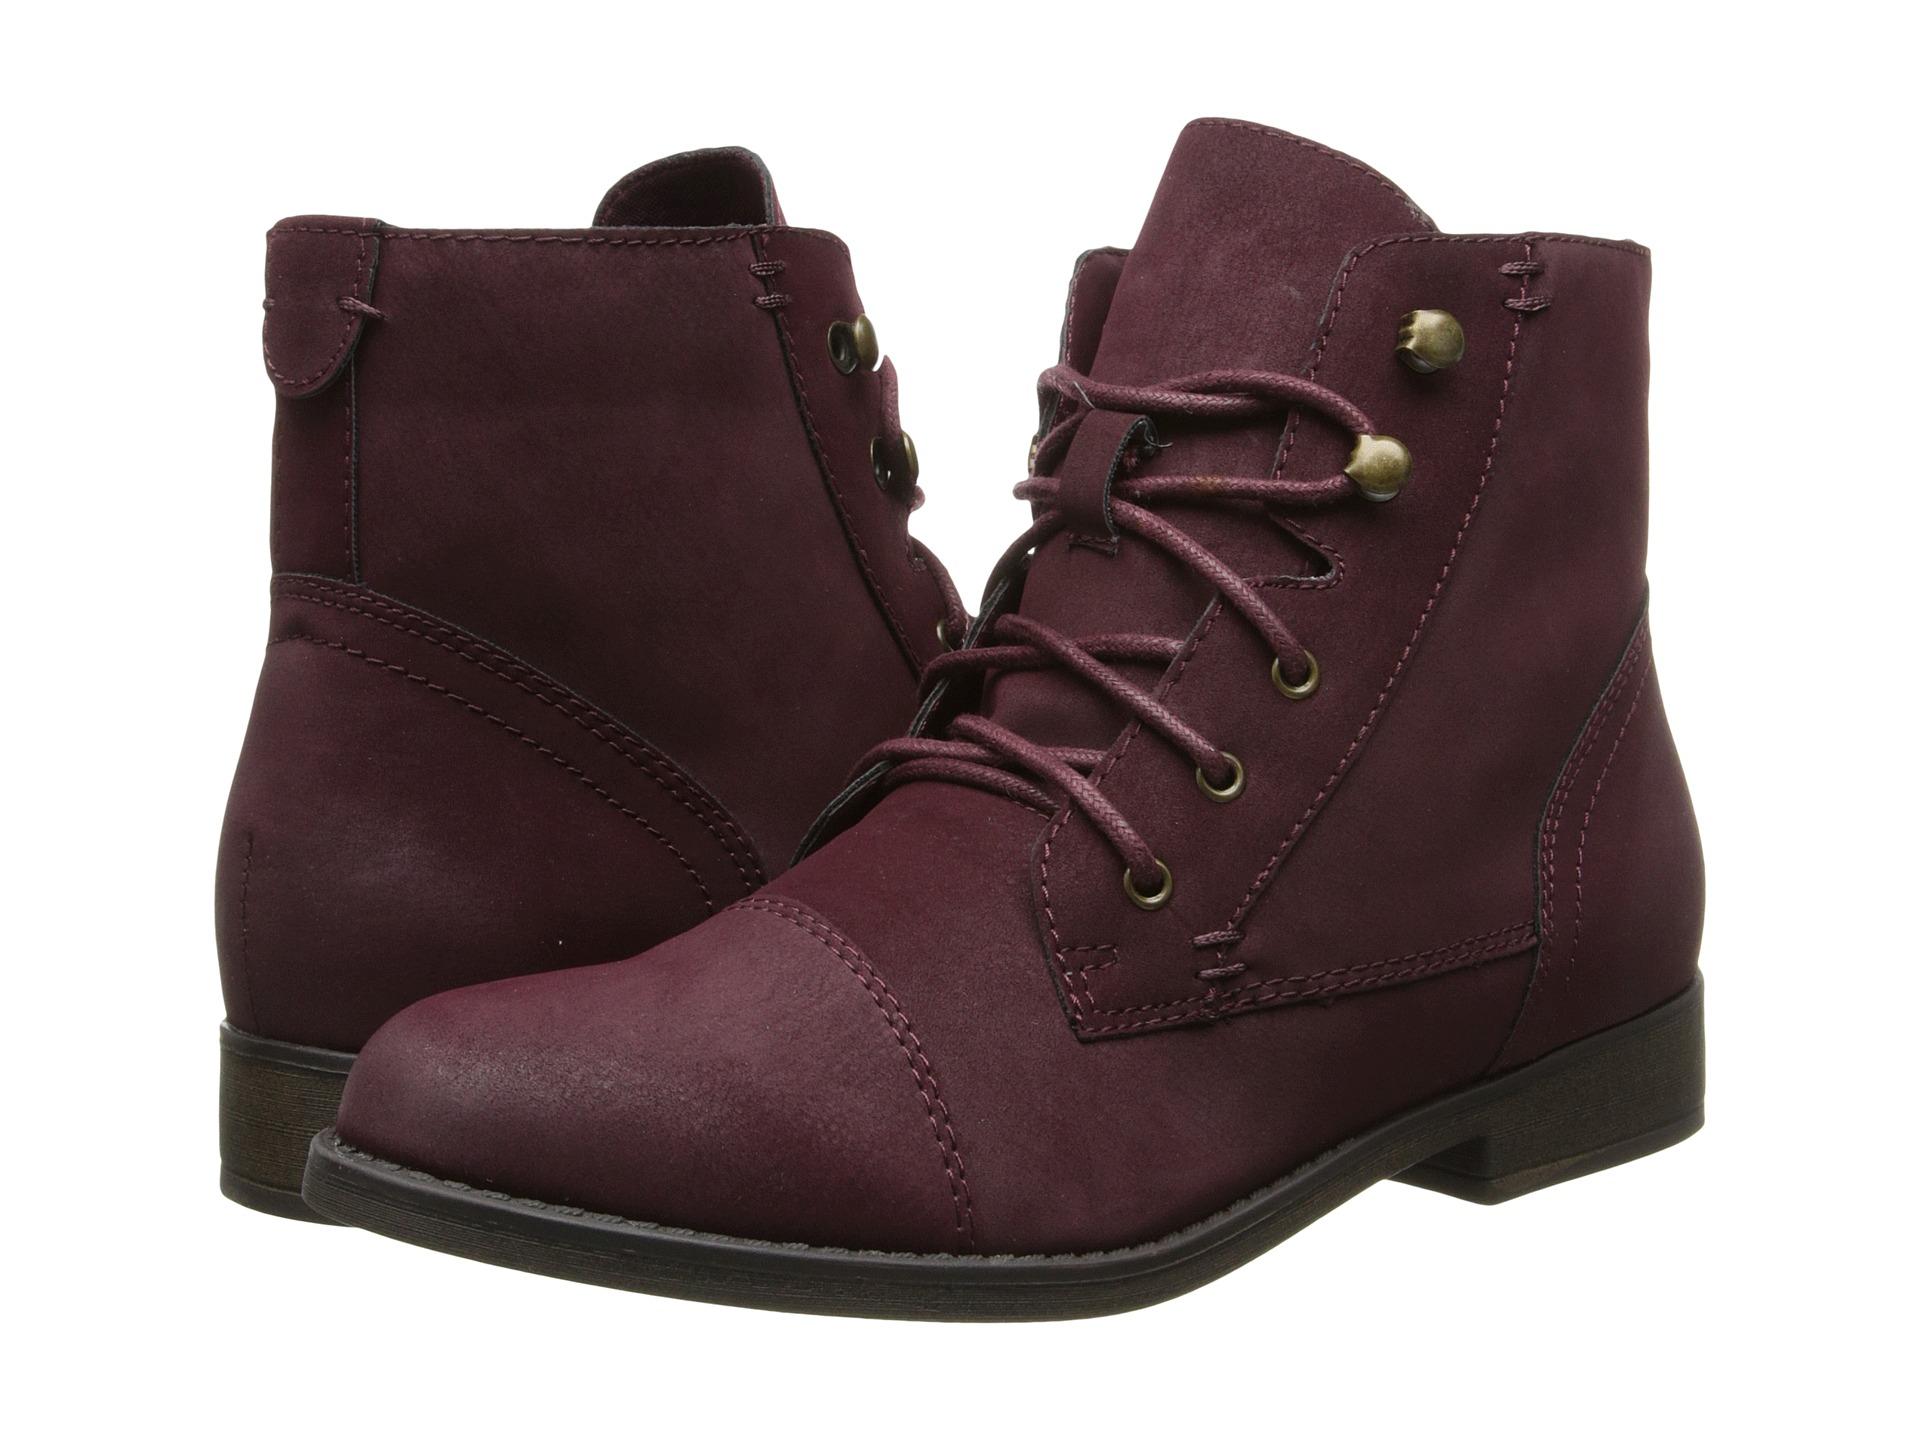 Jessica Simpson Shoe Boots